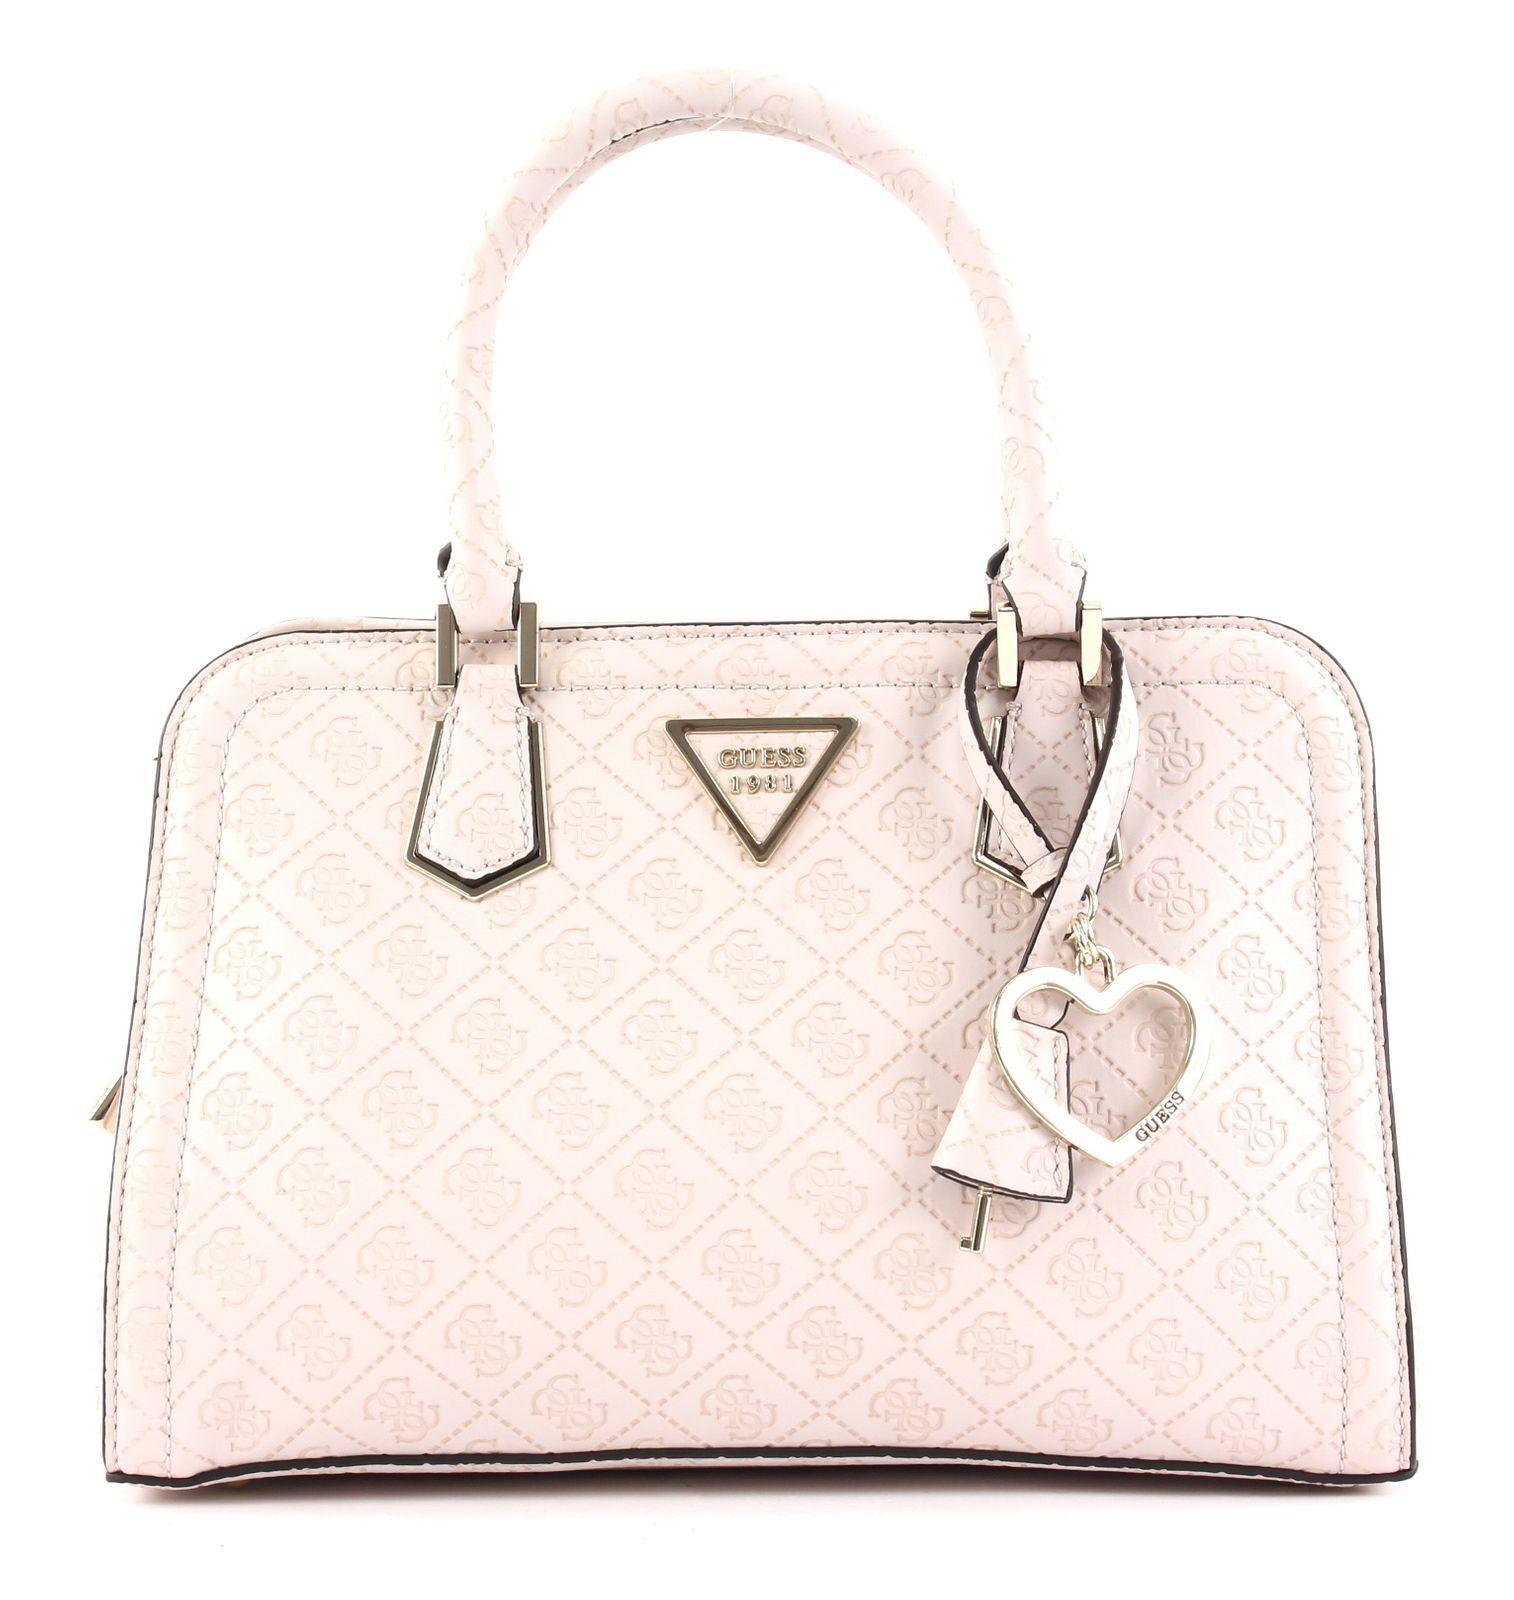 GUESS Lyra Small Girlfriend Satchel Handtasche Umhängetasche Tasche Stone Weiß